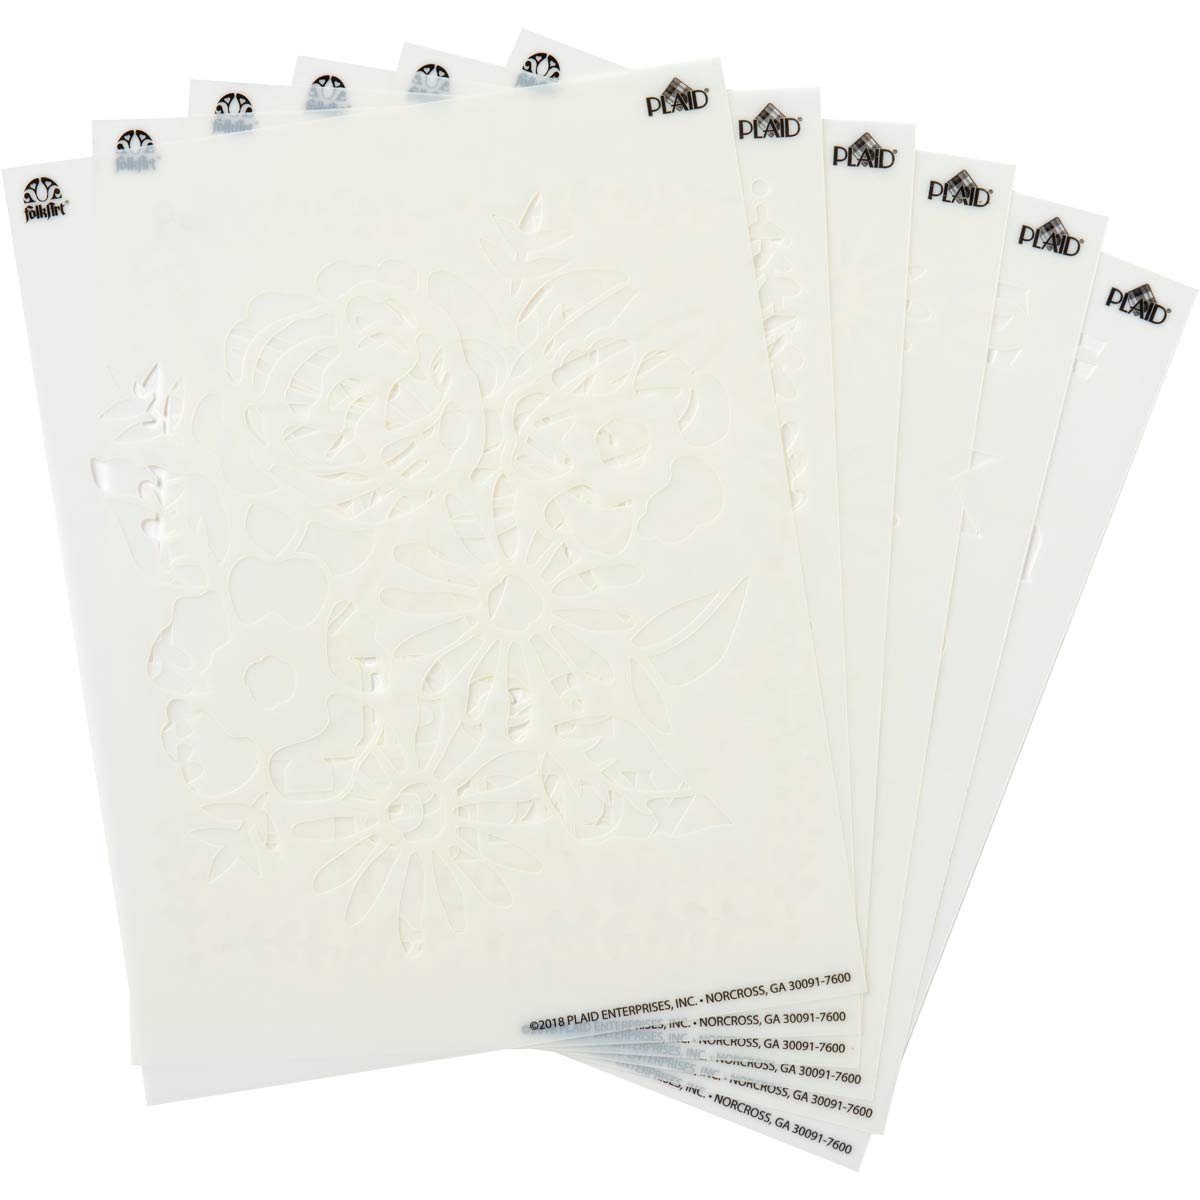 FolkArt ® Craft Stencils - Value Packs - Floral Tradition - 71968